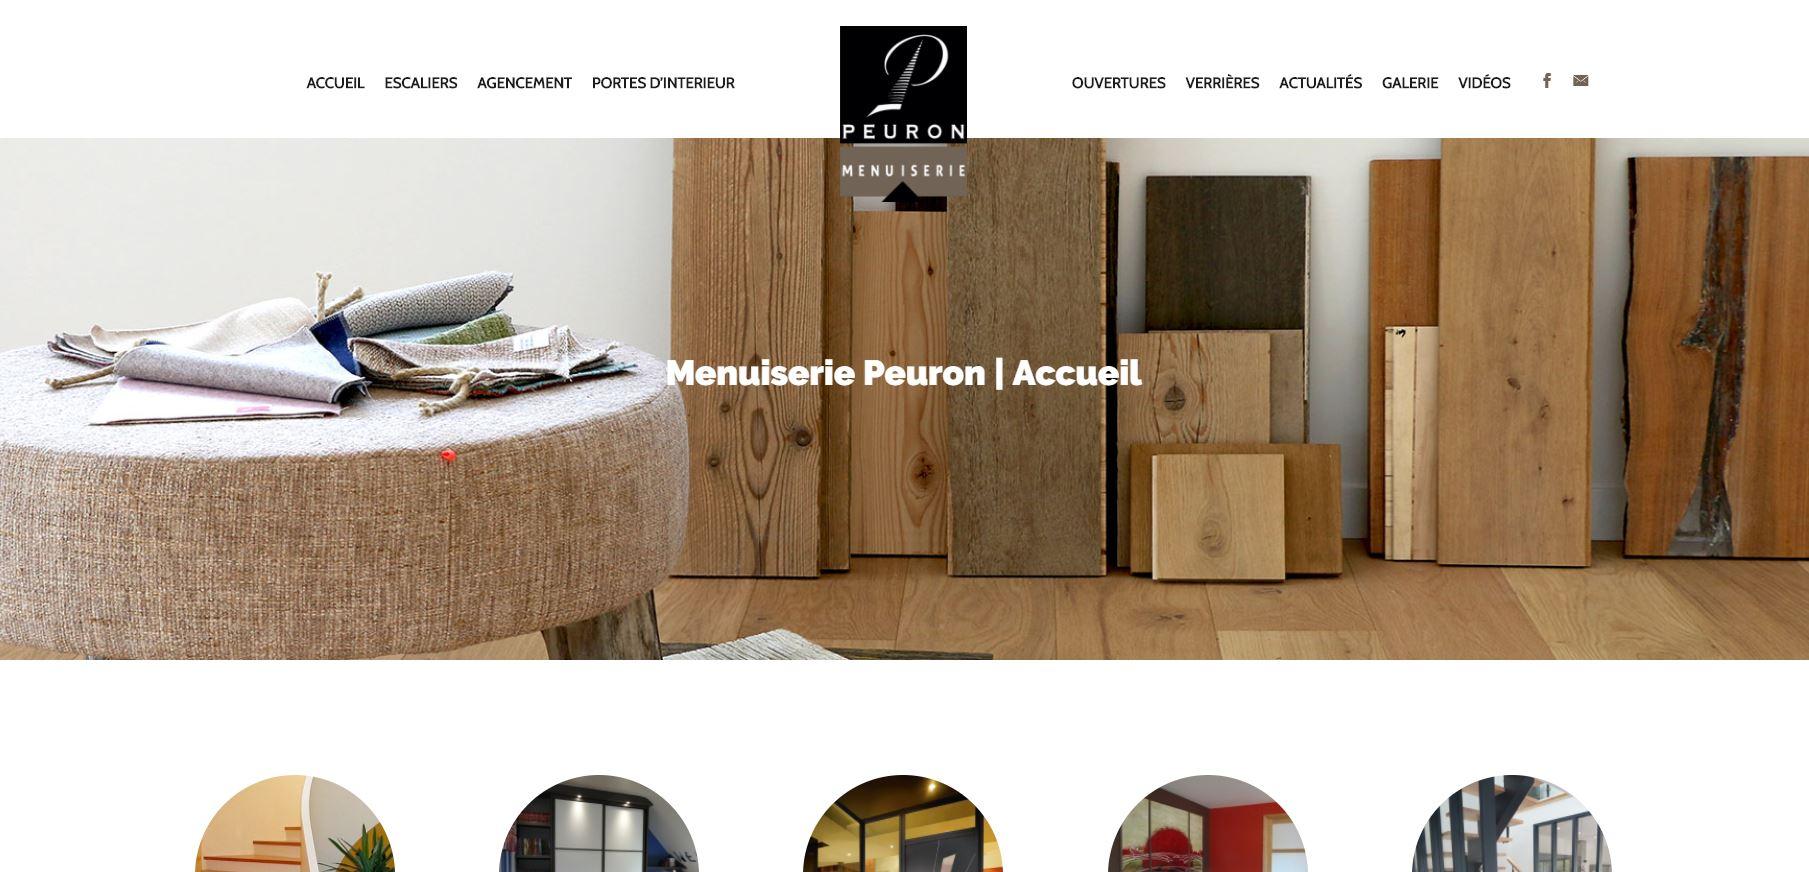 actualit s menuiserie peuron. Black Bedroom Furniture Sets. Home Design Ideas